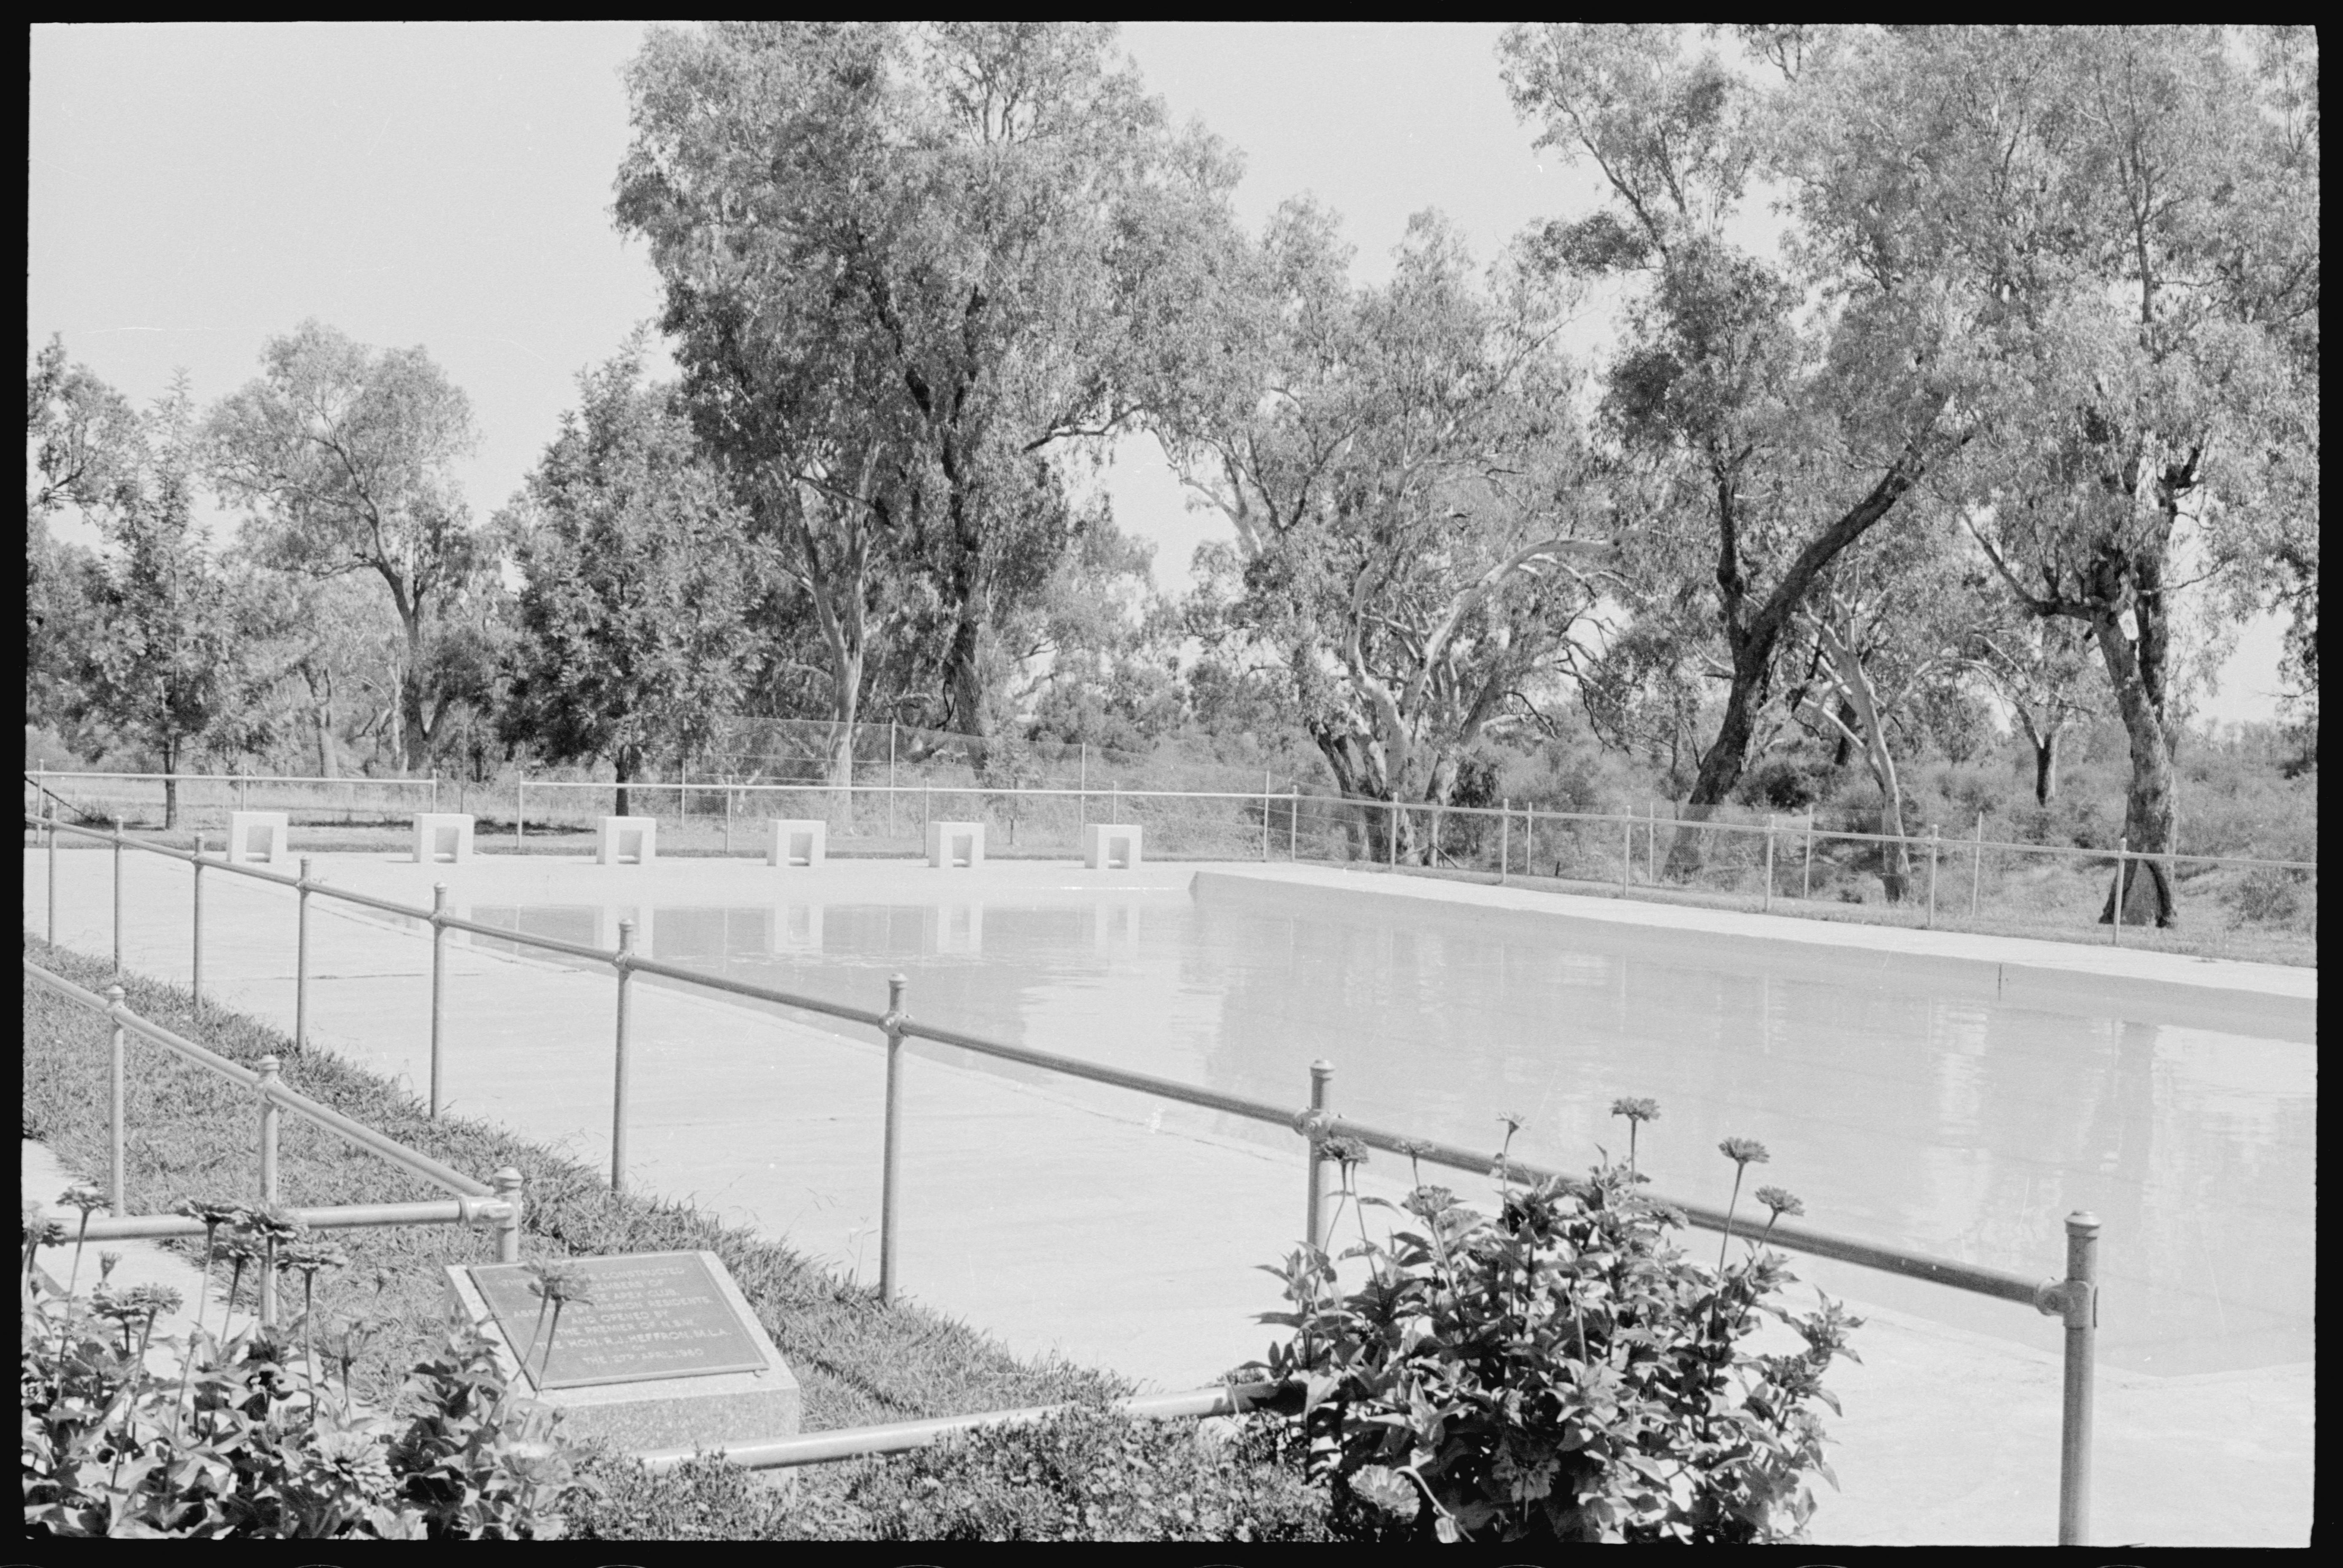 Swimming pool at Moree Aboriginal Station, February 1965 / The Tribune